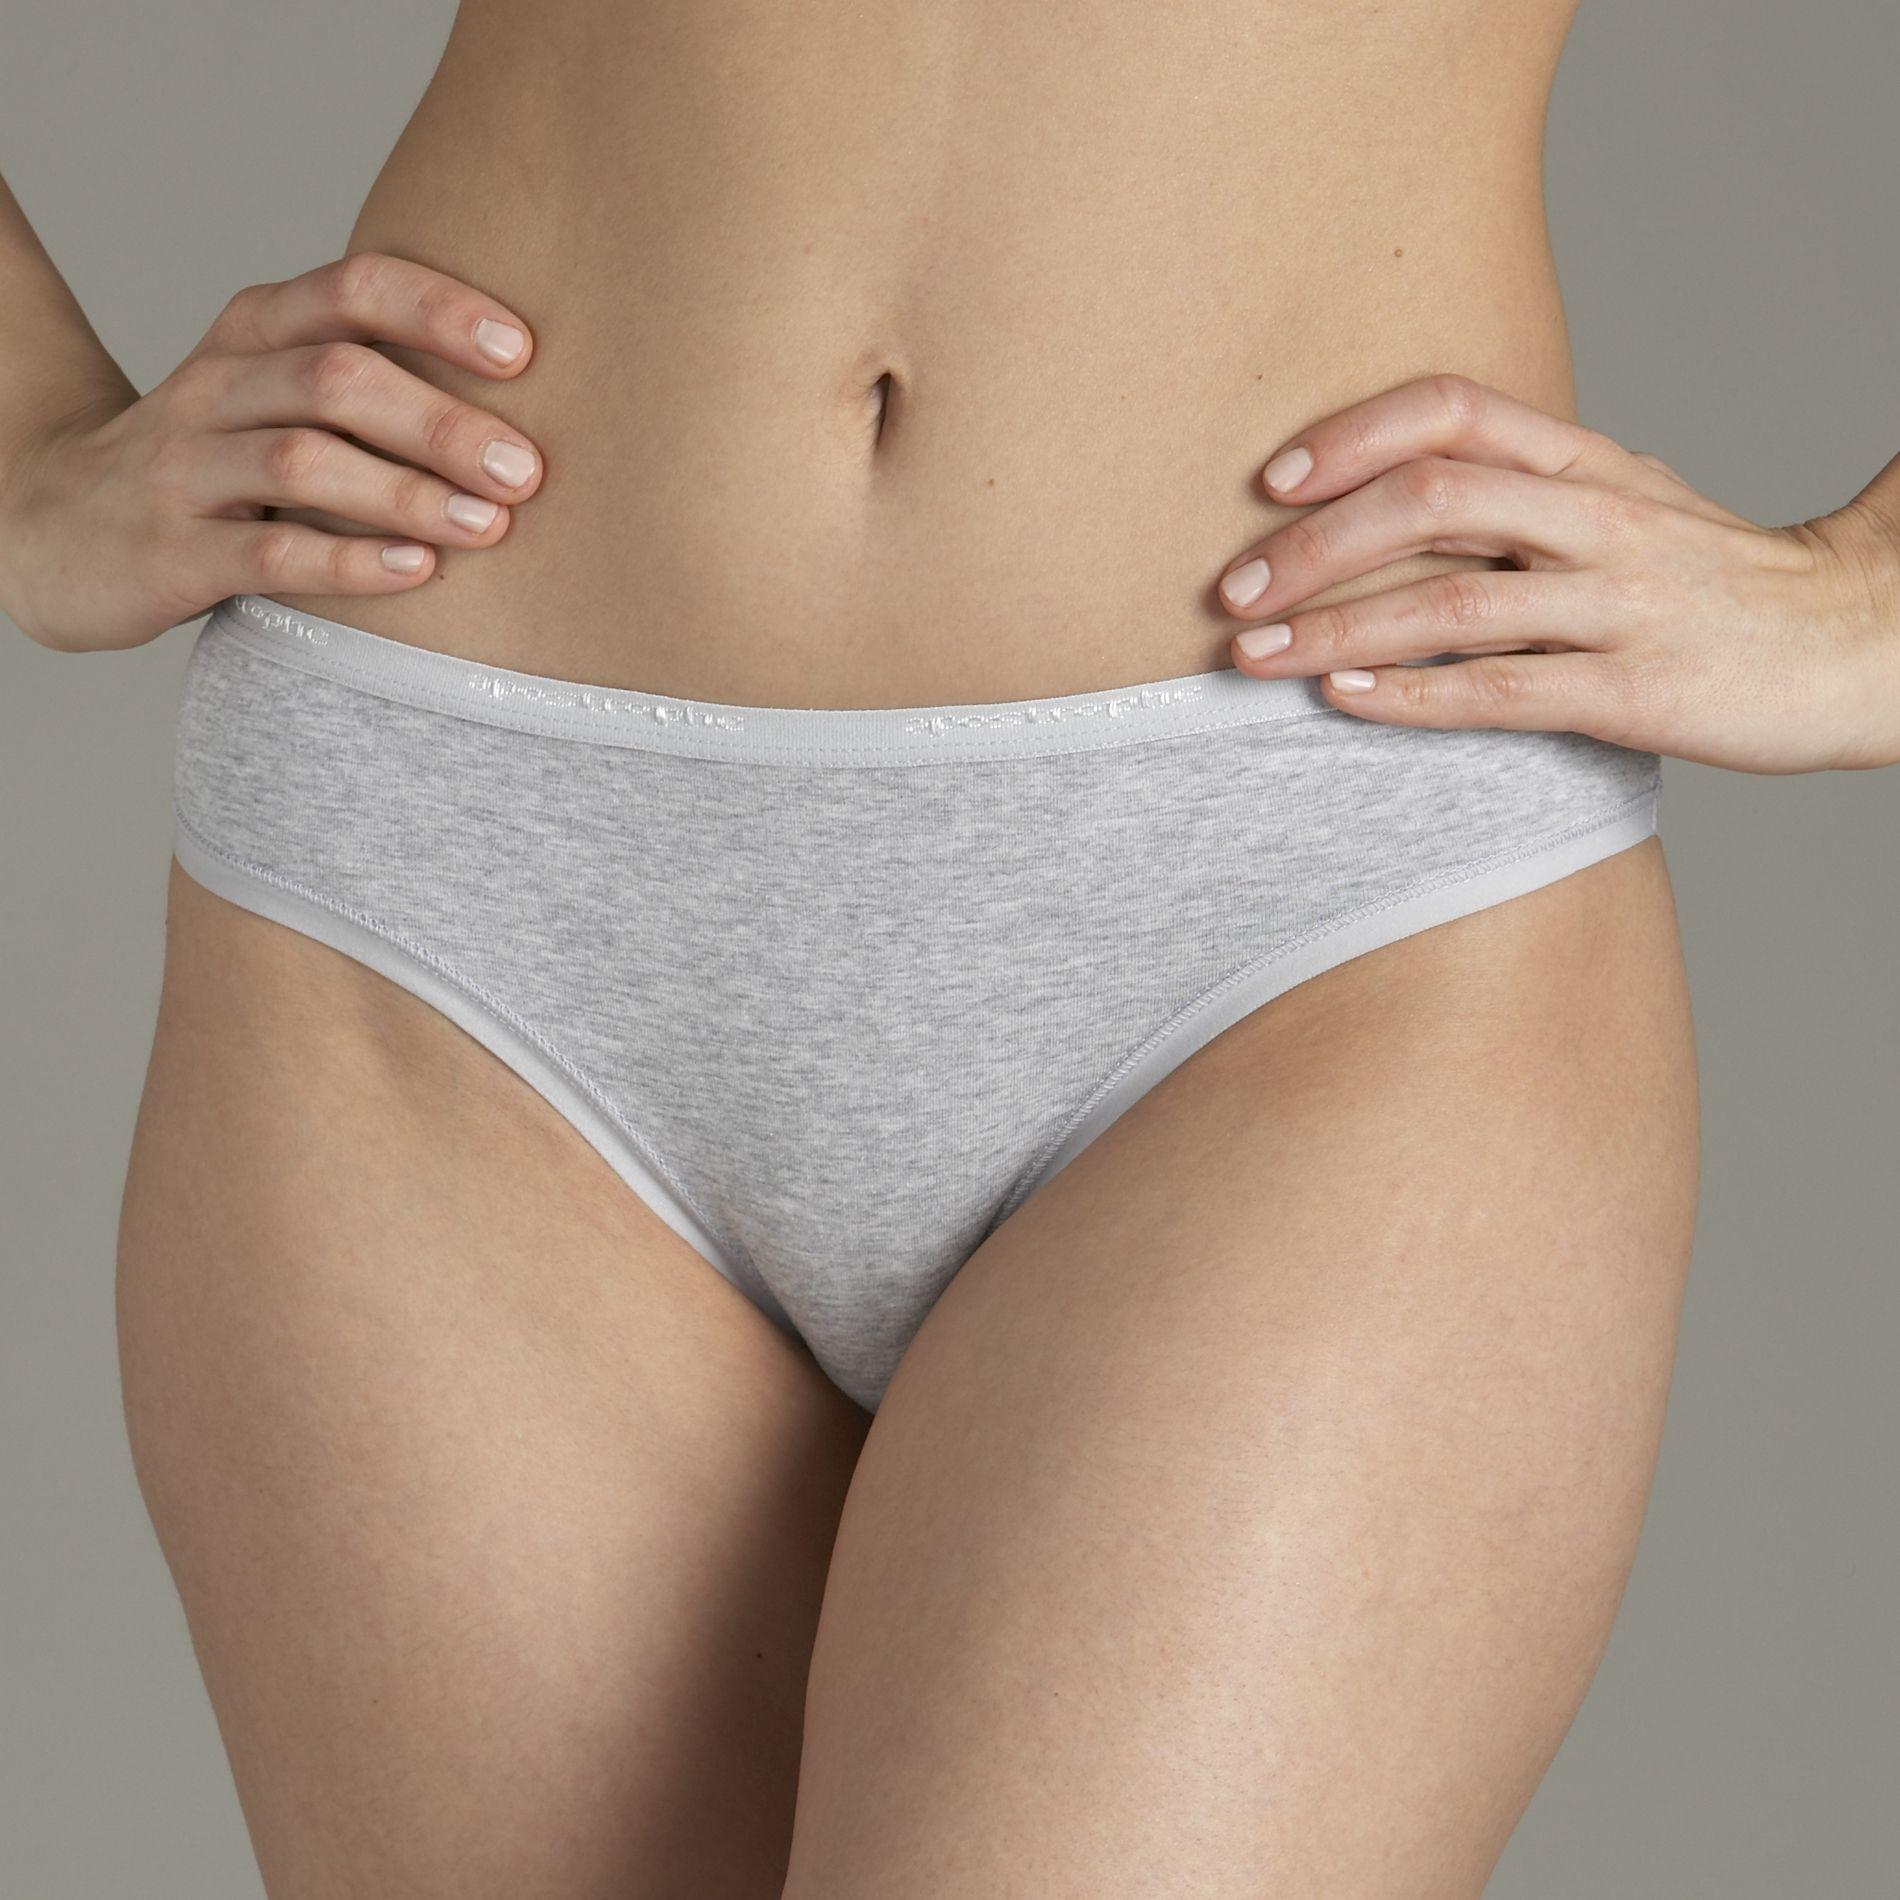 Wet white cotton panties